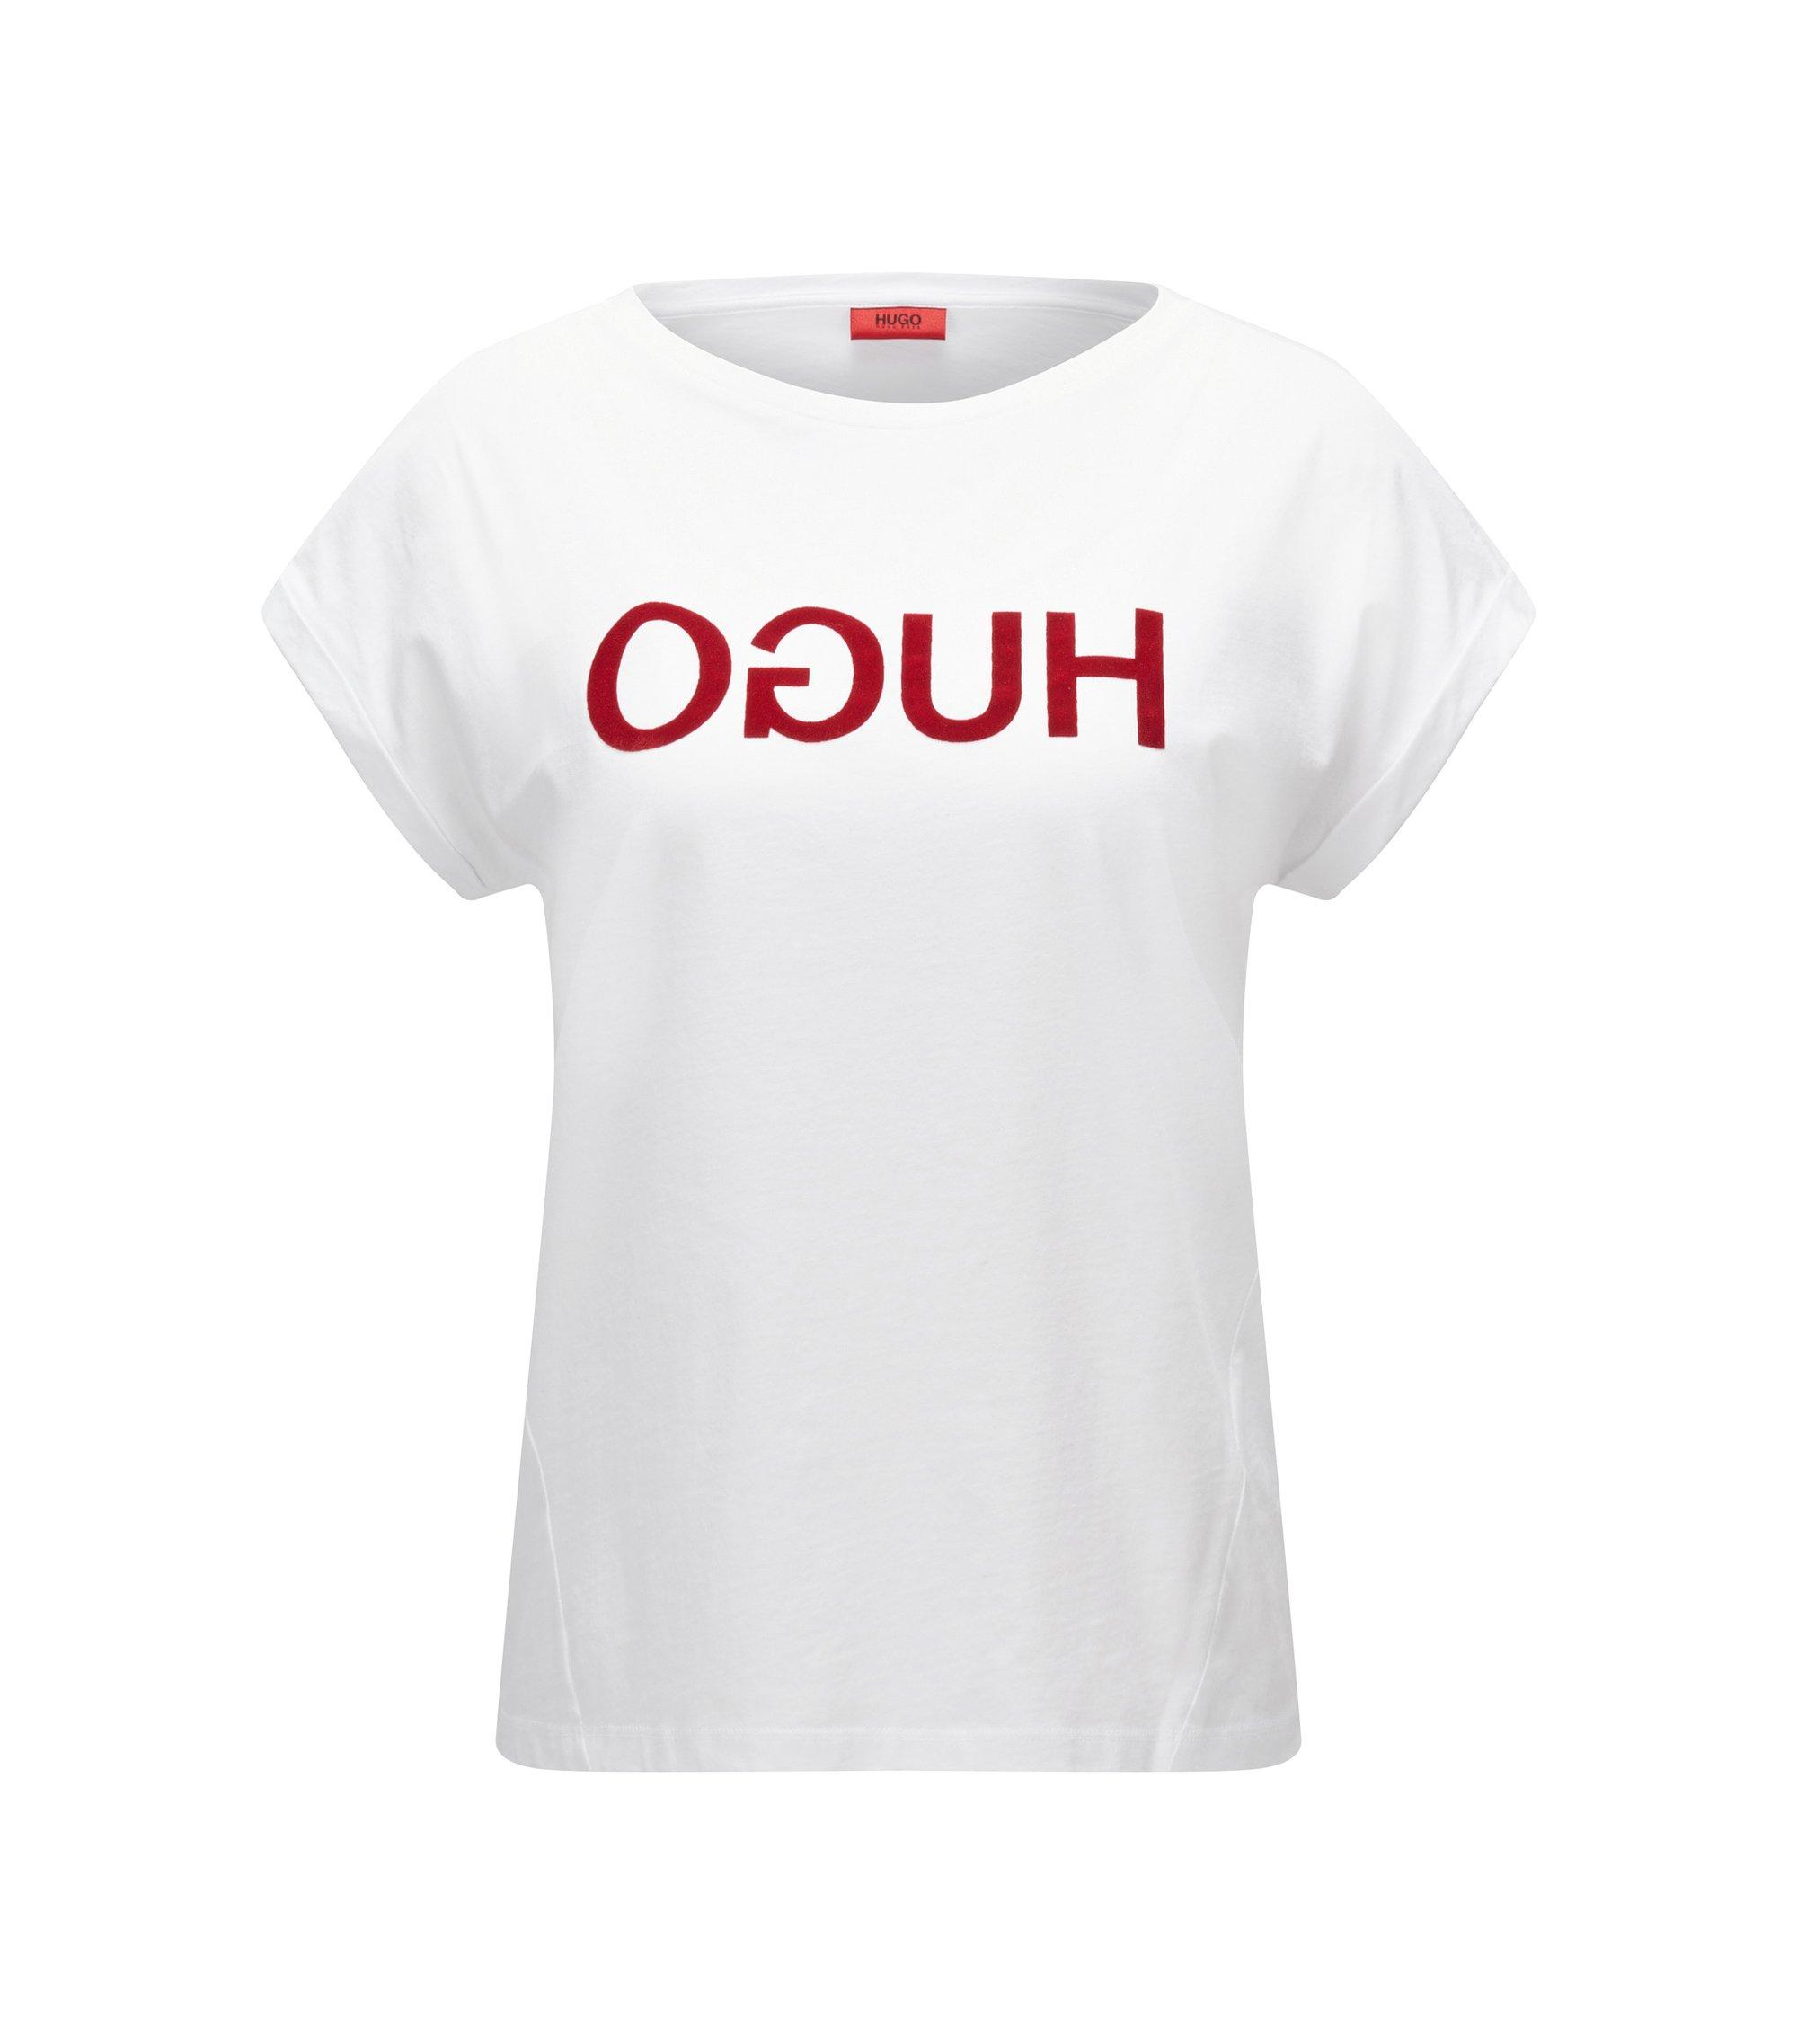 T-shirt relaxed fit in jersey di cotone con logo a rovescio, Bianco